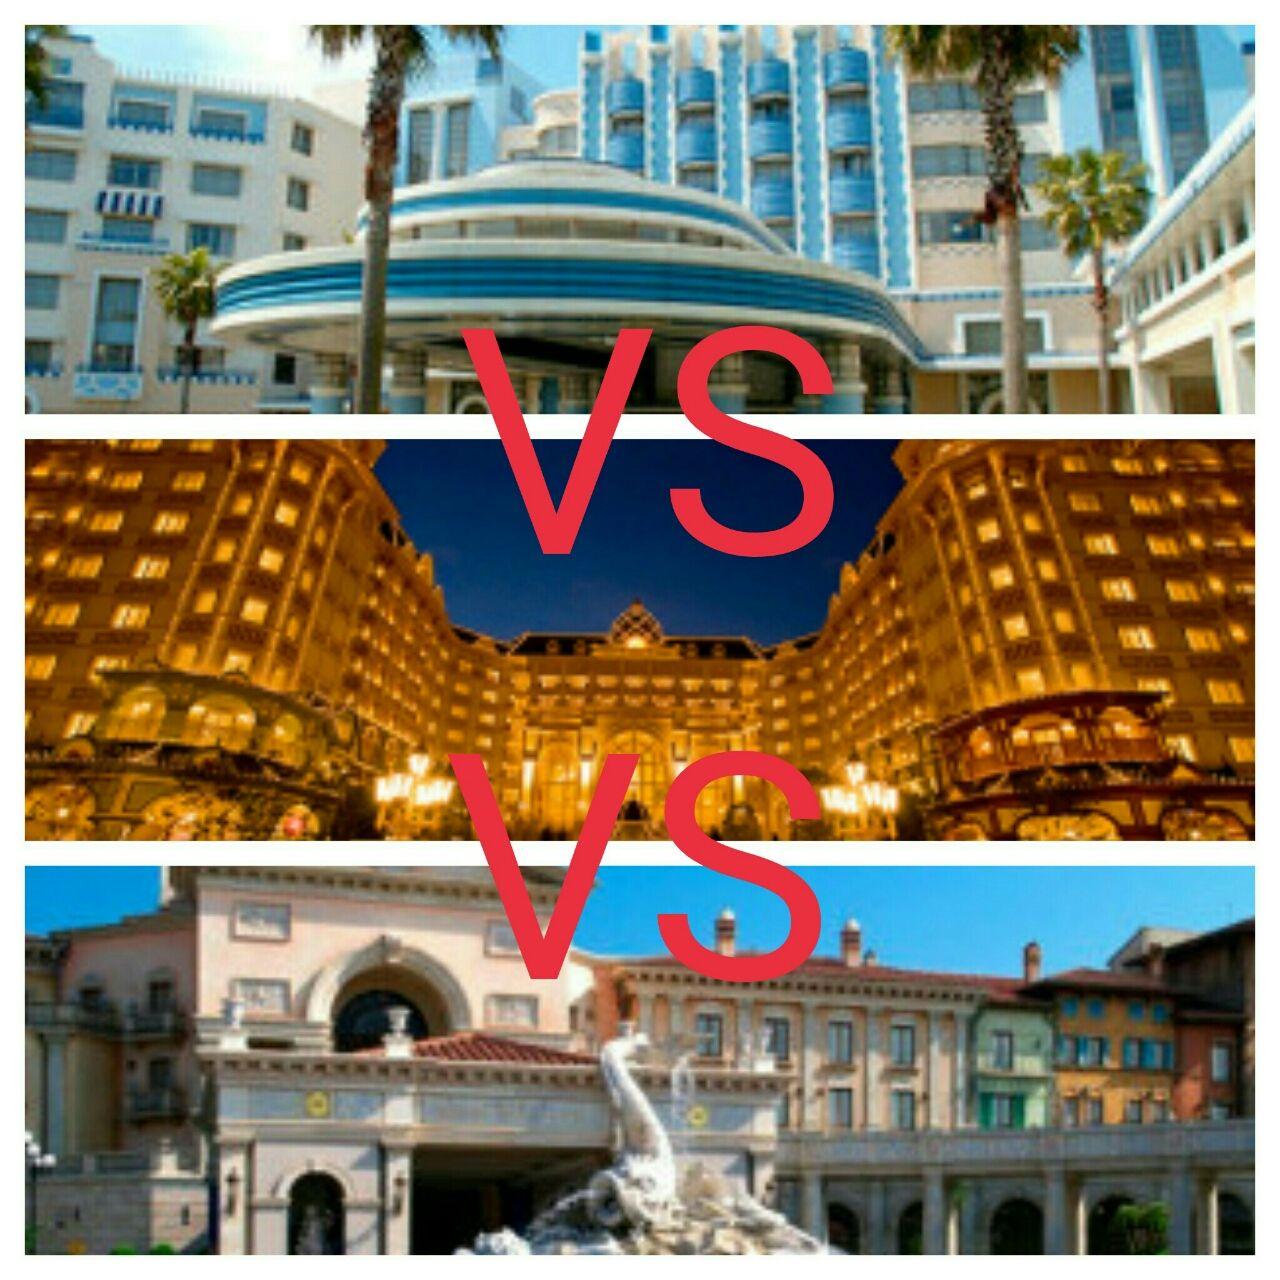 disney`s imagination blog : ディズニーホテルで一番人気なのはどれ